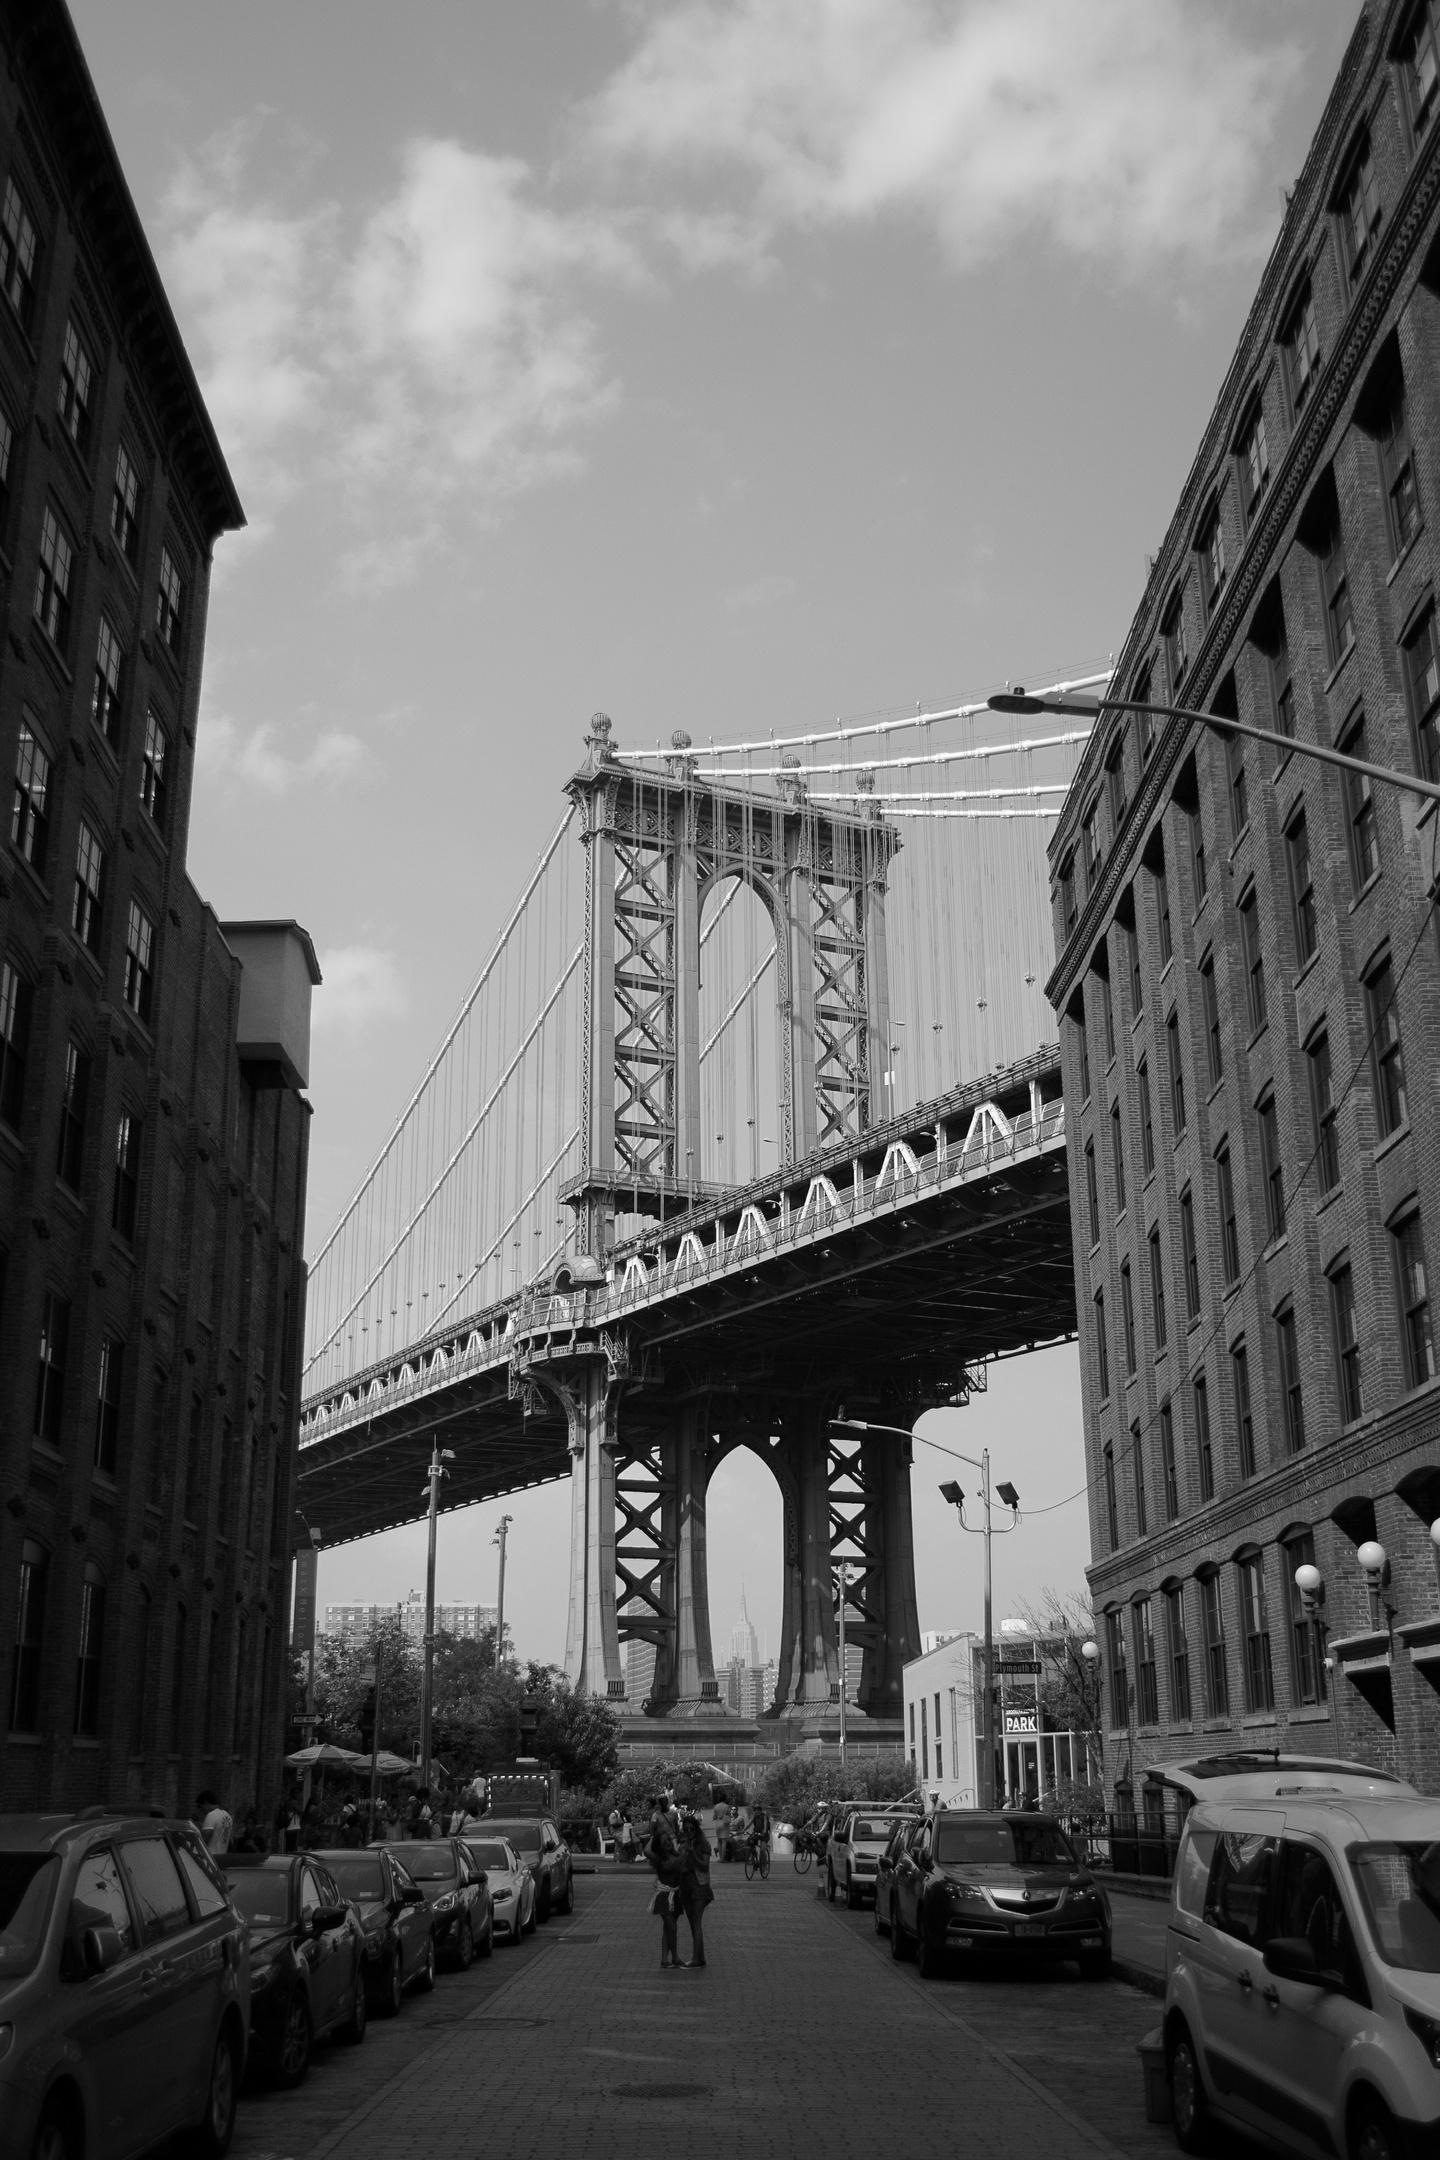 New York Stories 2 - Dumbo, Brooklyn